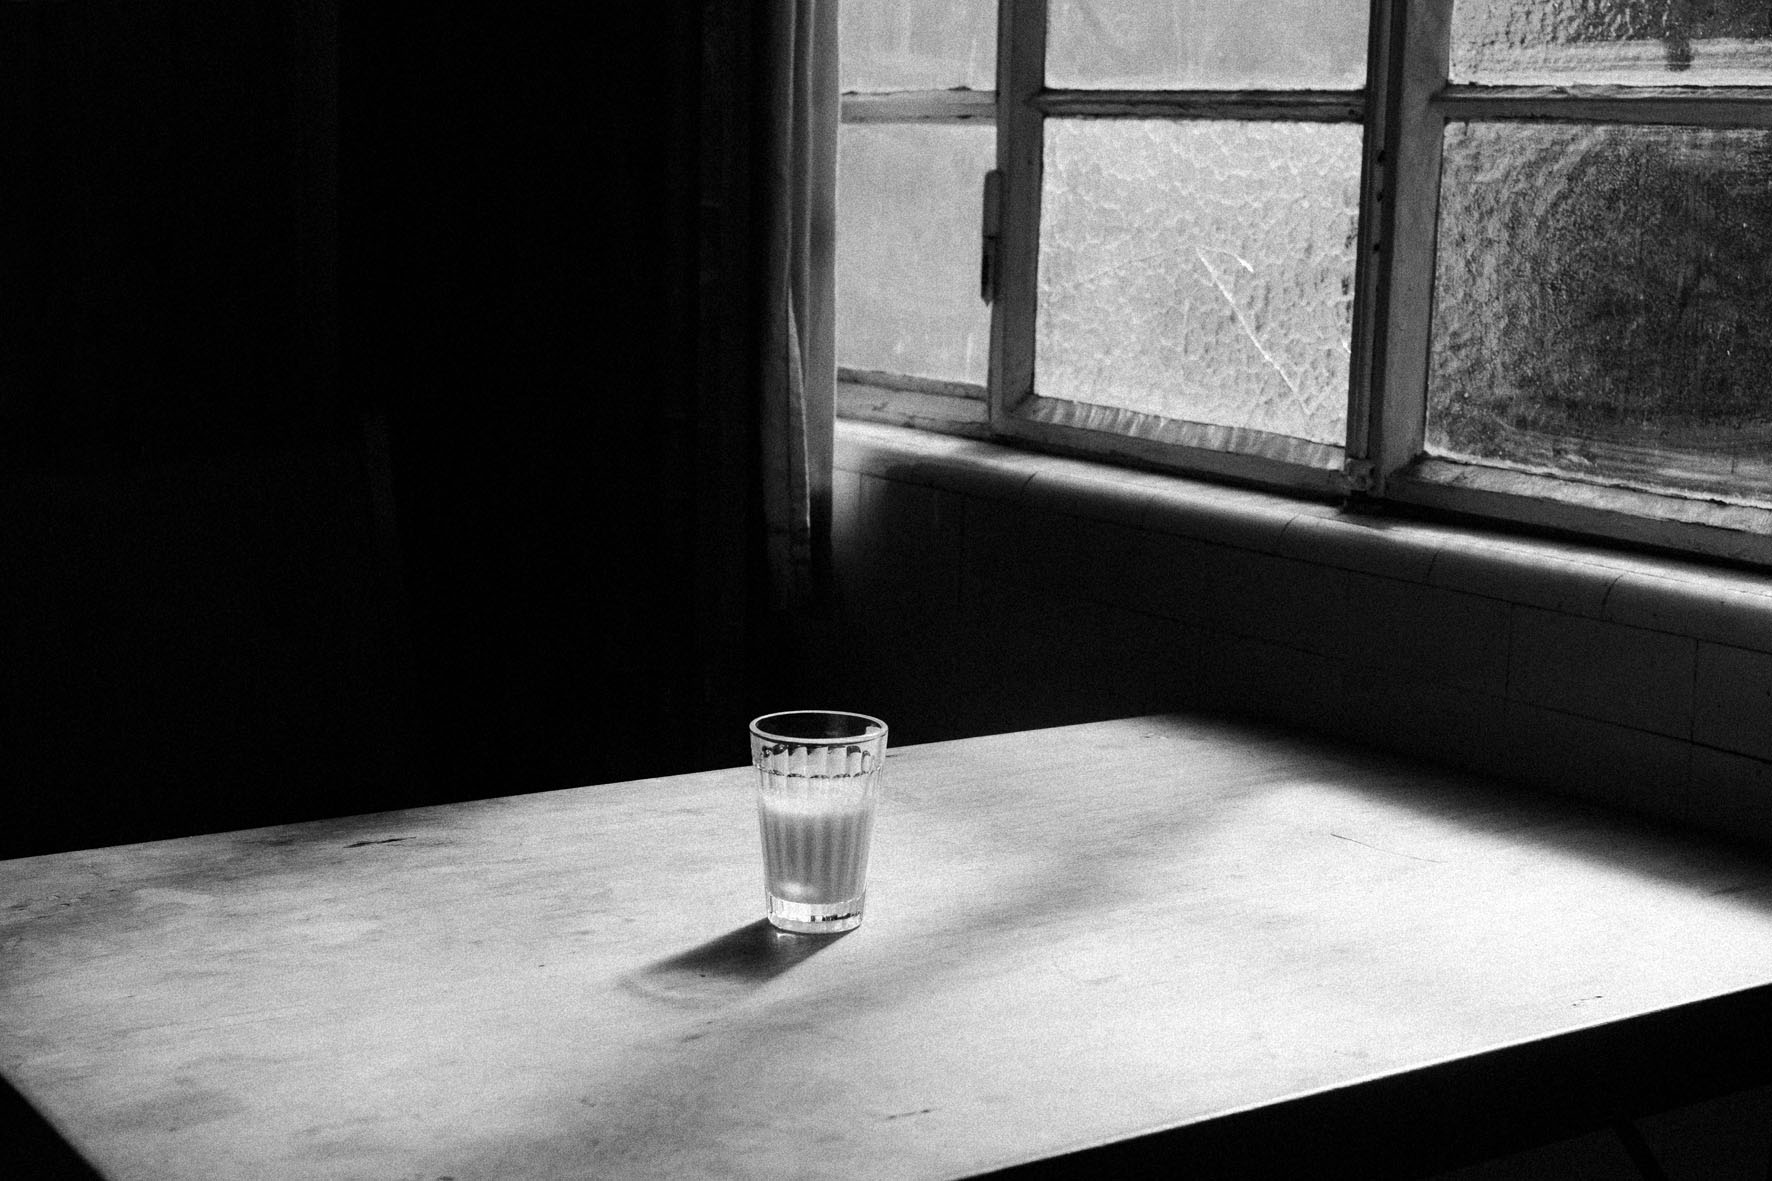 Daniel Blaufuks_21 de Setembro de 2015 3:06, from the series Attempting Exhaustion 100 X 150 cm, Inkjet print on paper GALERIA Vera Cortês, LISBOA © DANIEL BLAUFUKS